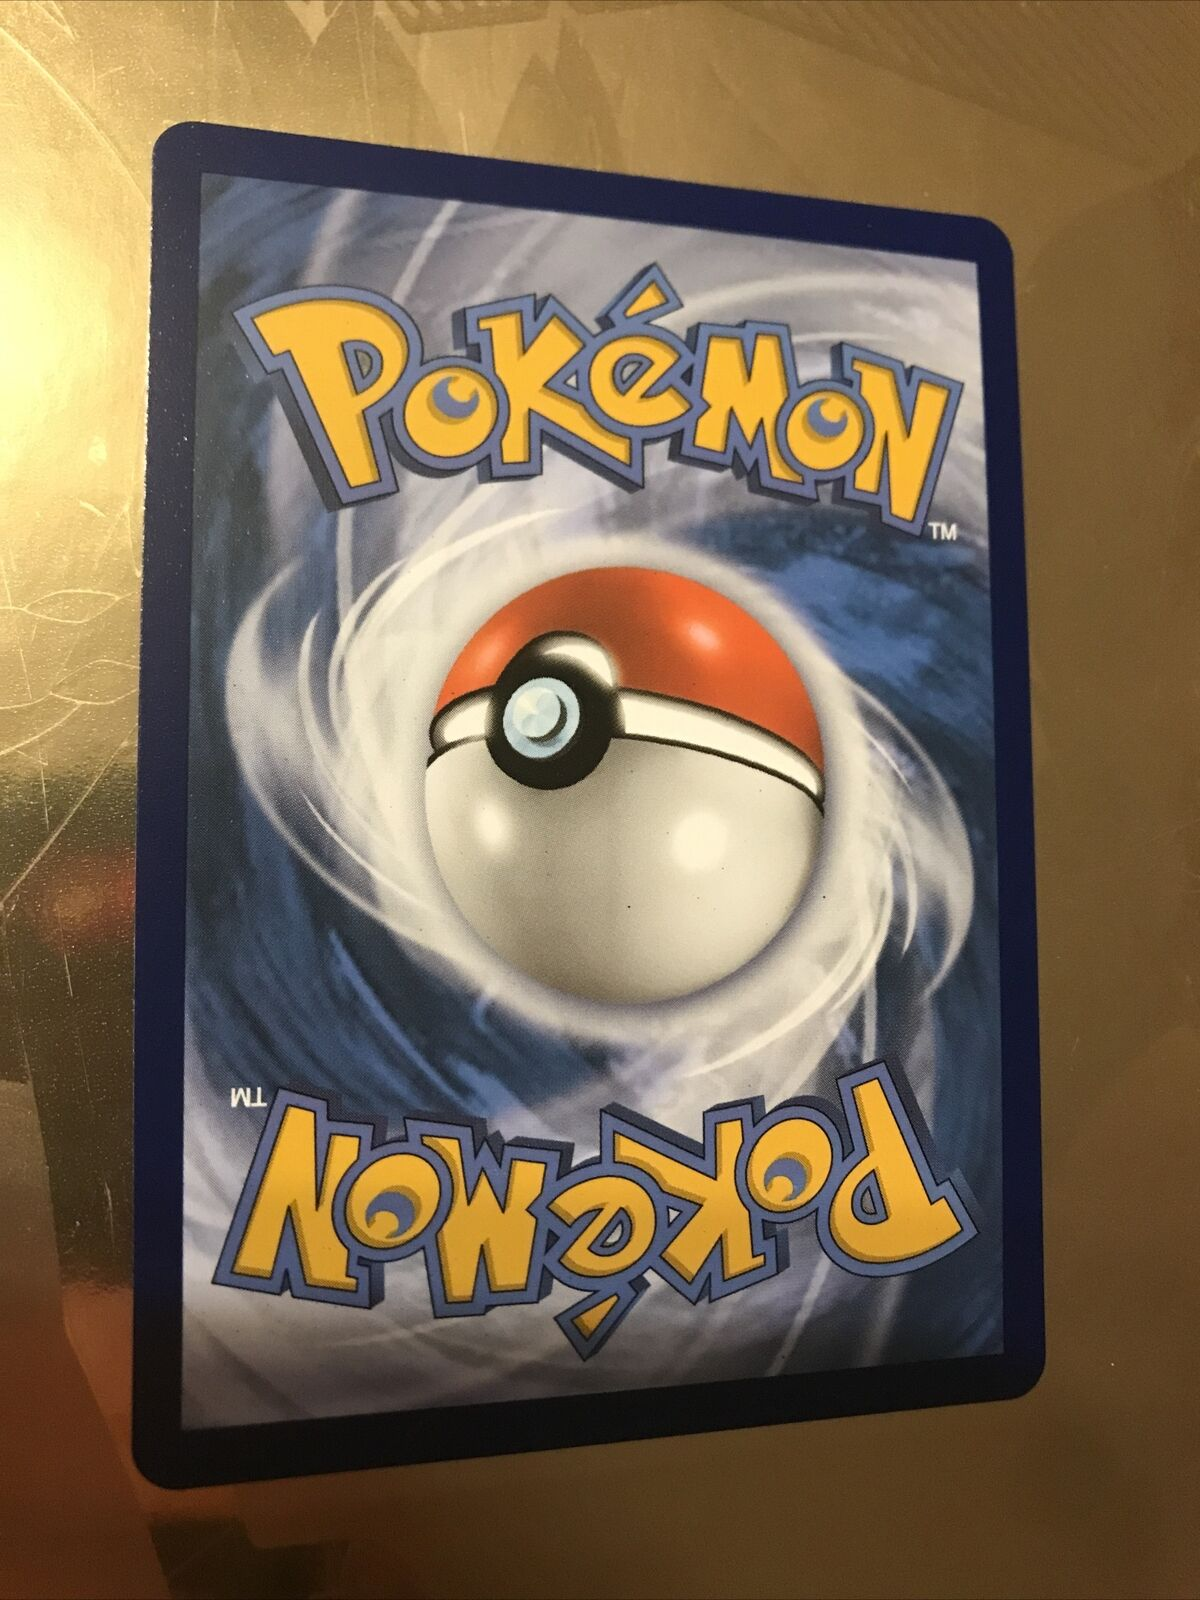 Blaziken VMAX 021/198 Pokémon TCG Chilling Reign Full Art Ultra Rare Near Mint - Image 5